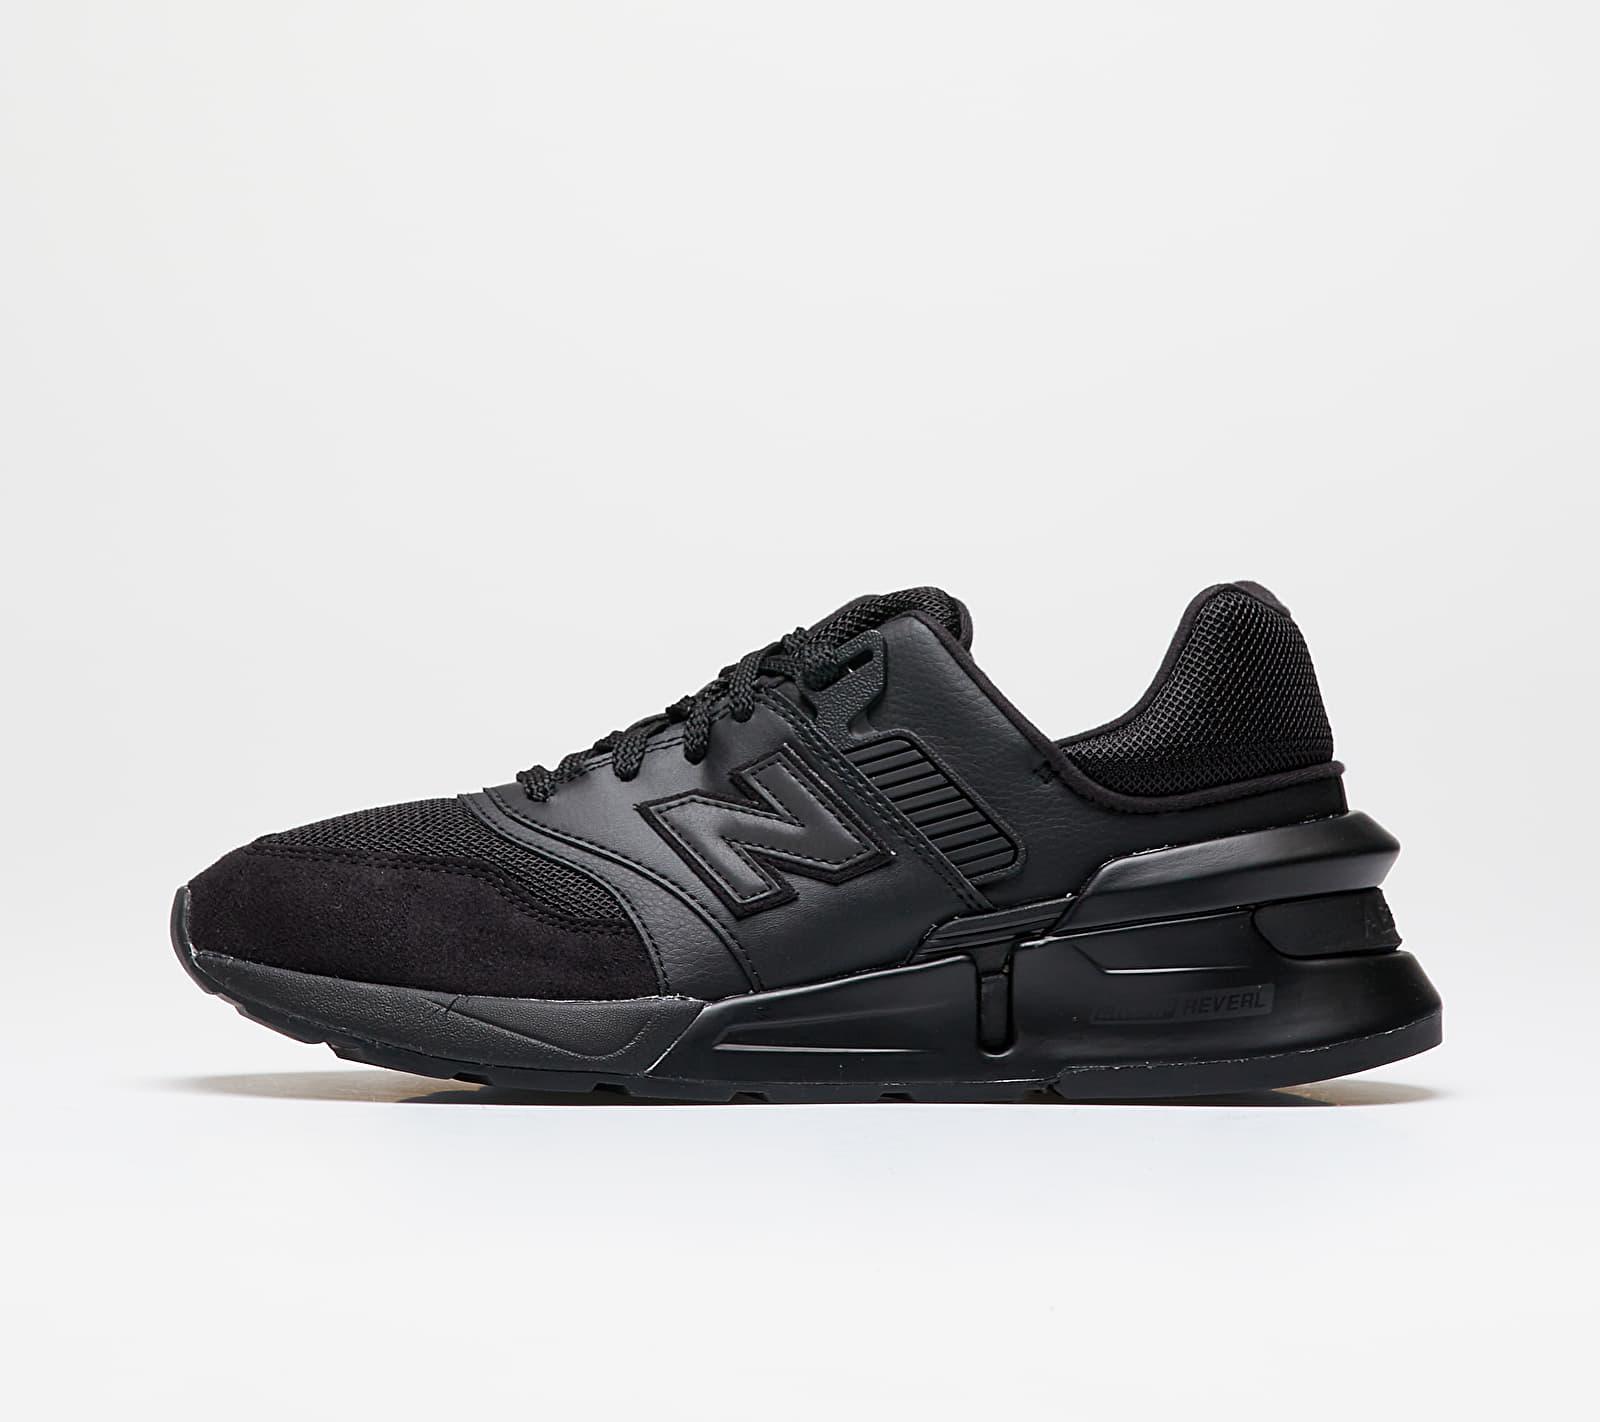 New Balance 997 Black EUR 41.5